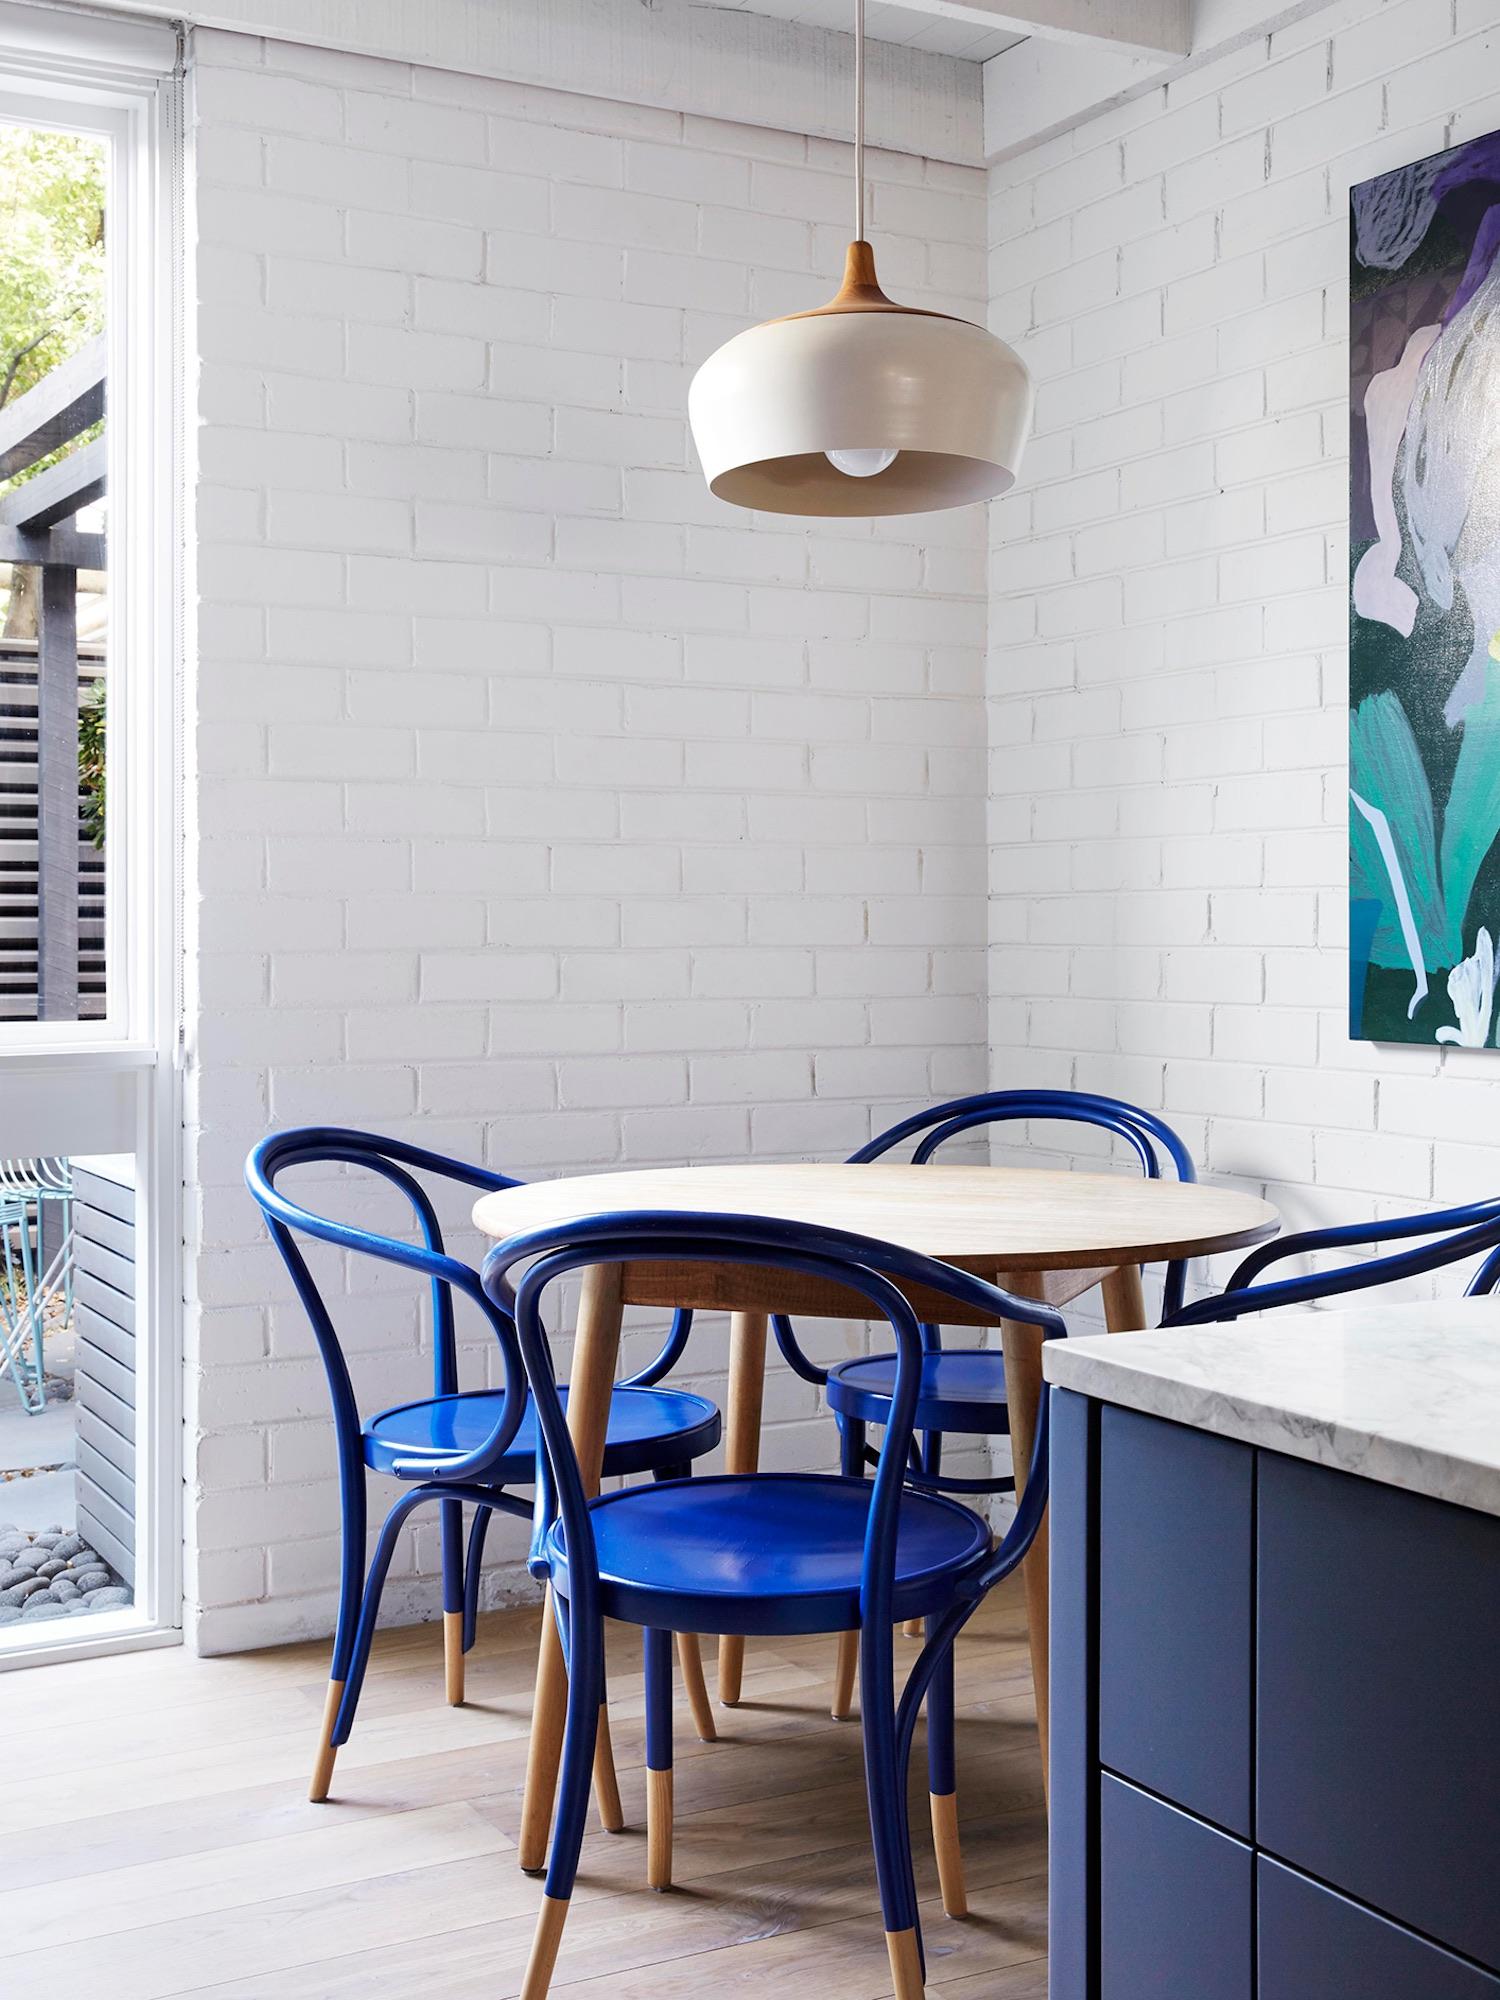 est living compact kitchens fitzroy north townhouse lisa breeze 4 1